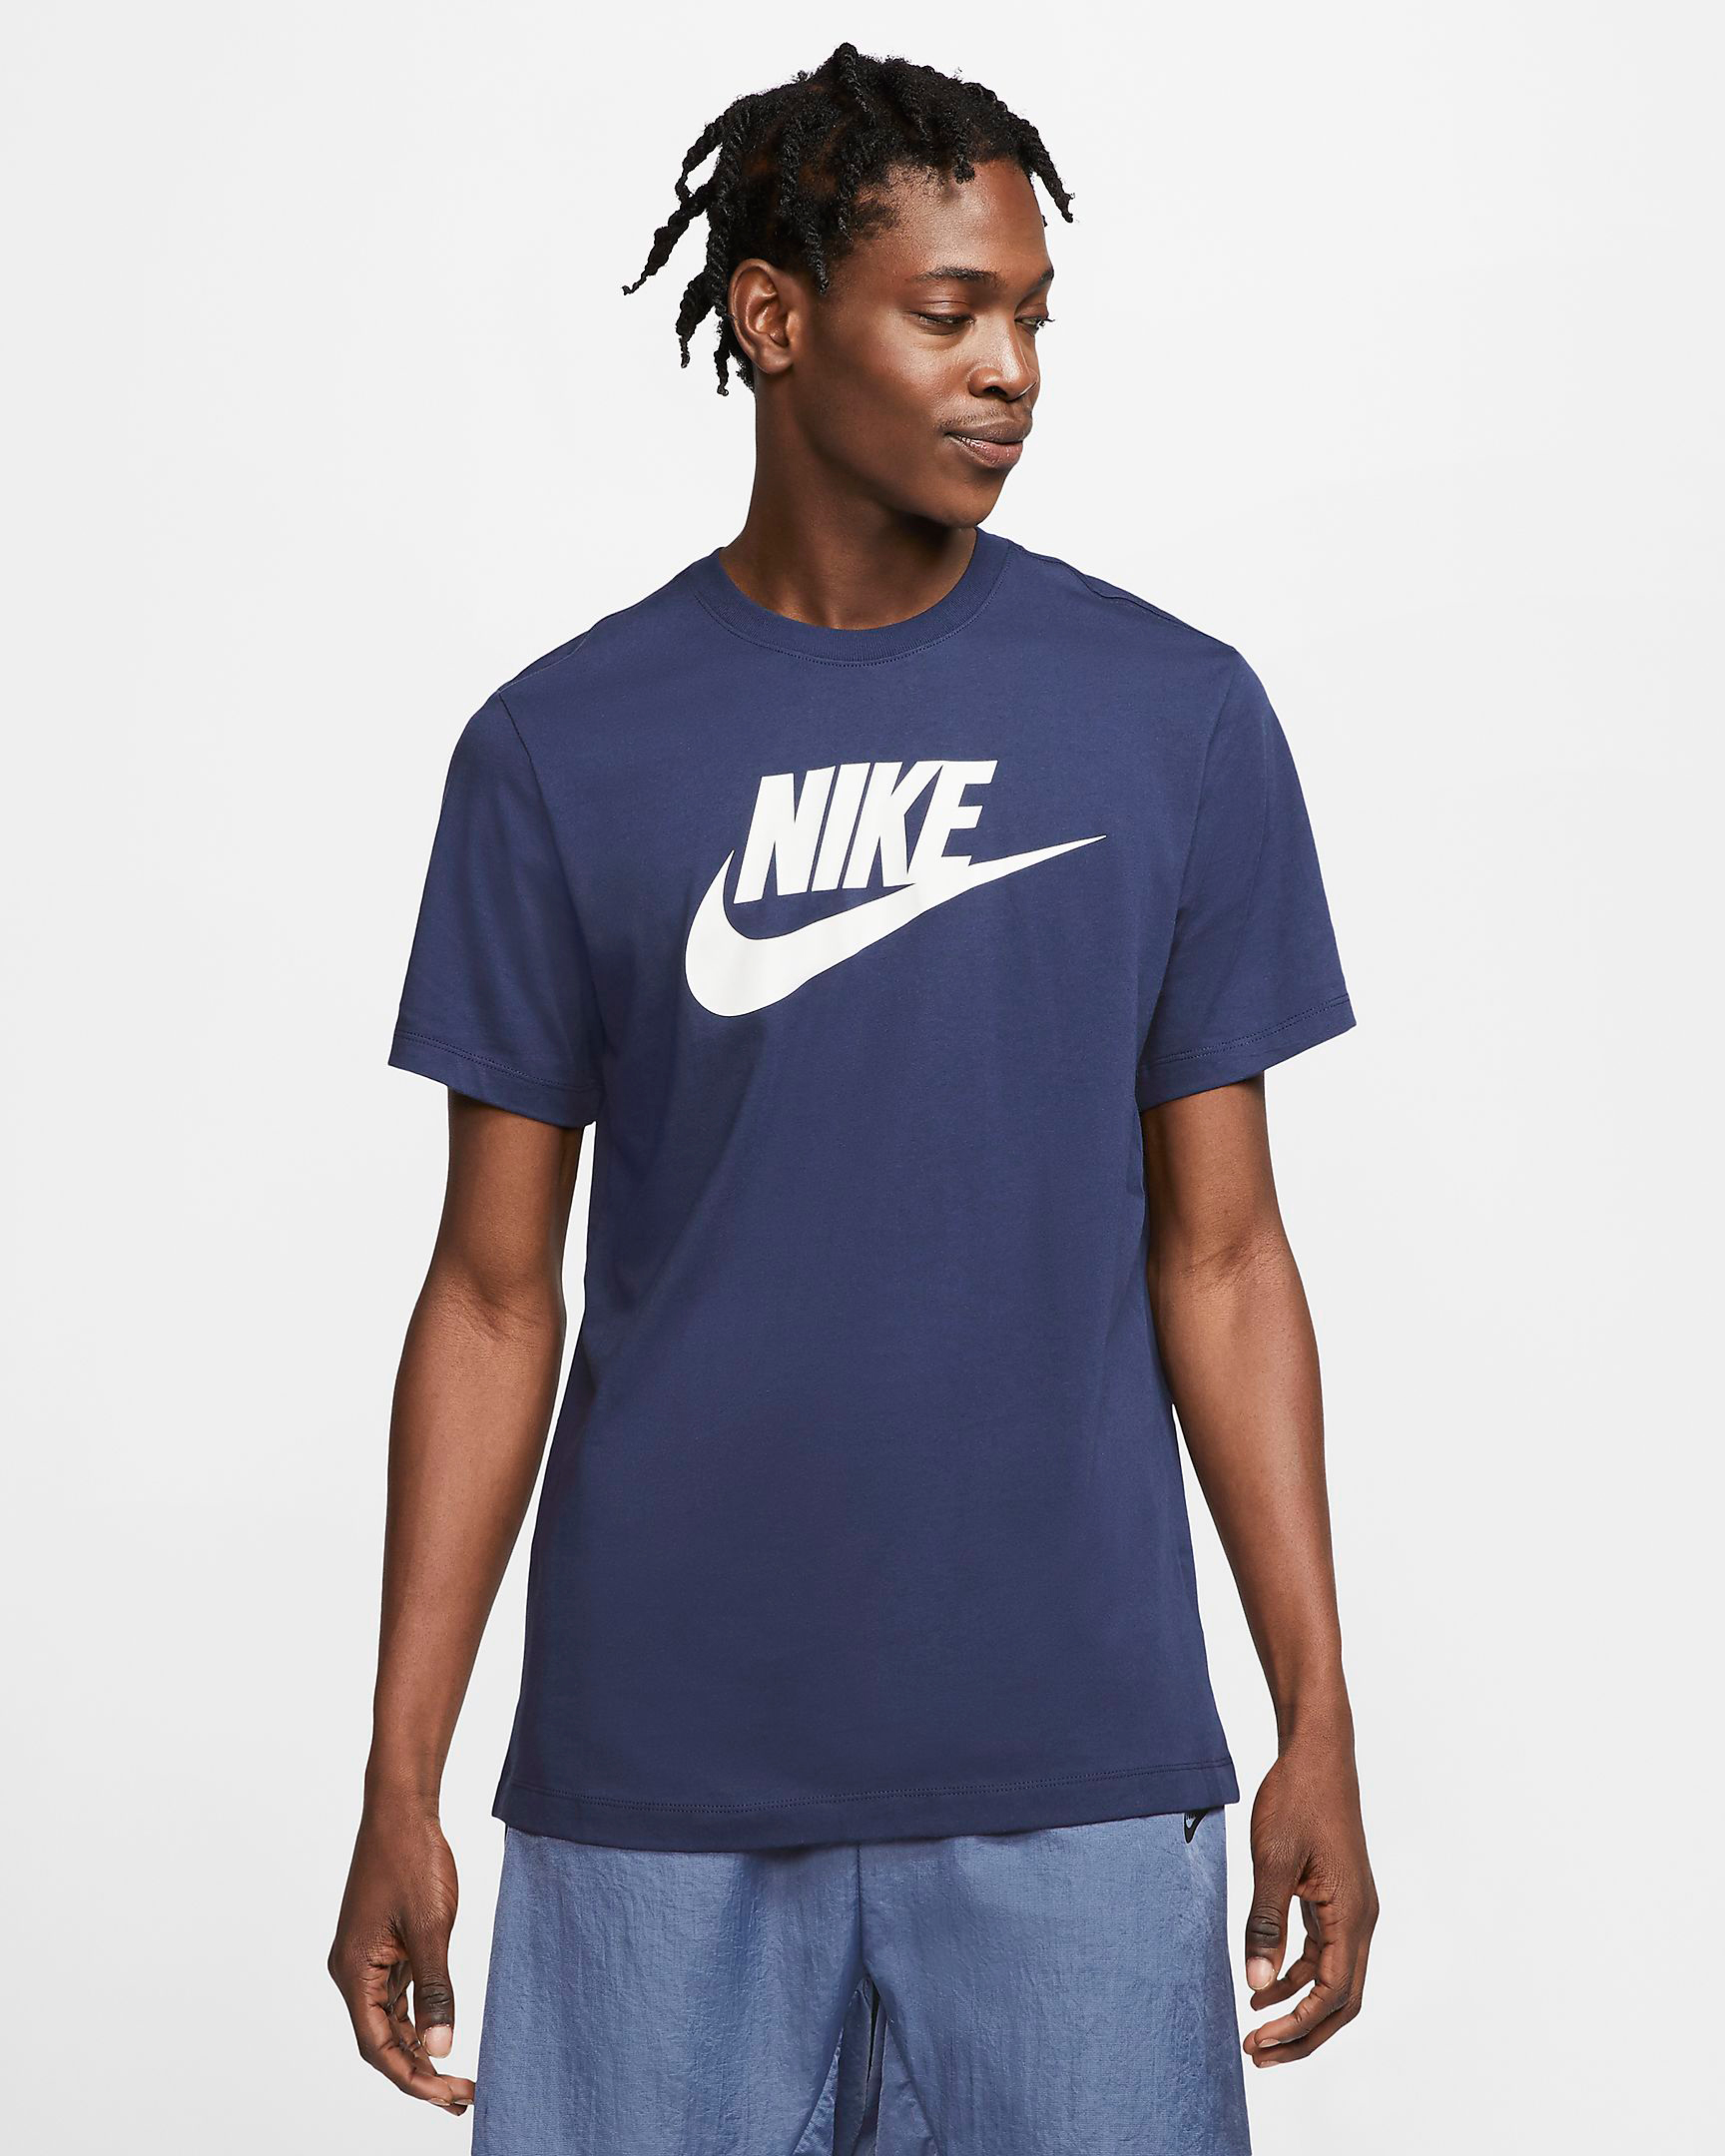 jordan-3-midnight-navy-nike-tee-shirt